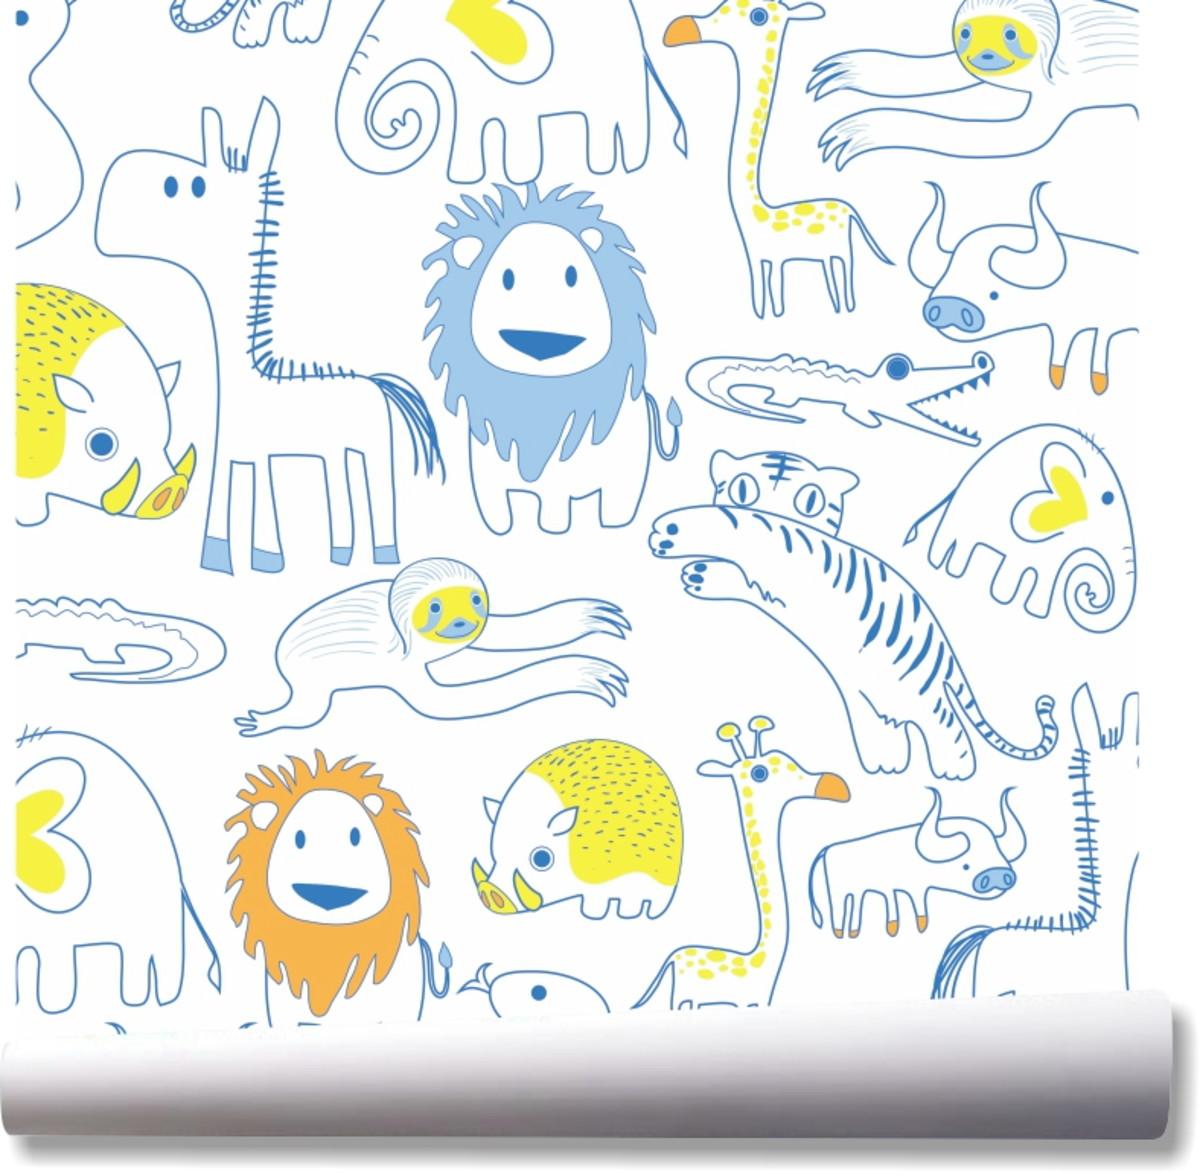 Papel De Parede Crianca Leao Animais Safari Zoo Desenho A04 No